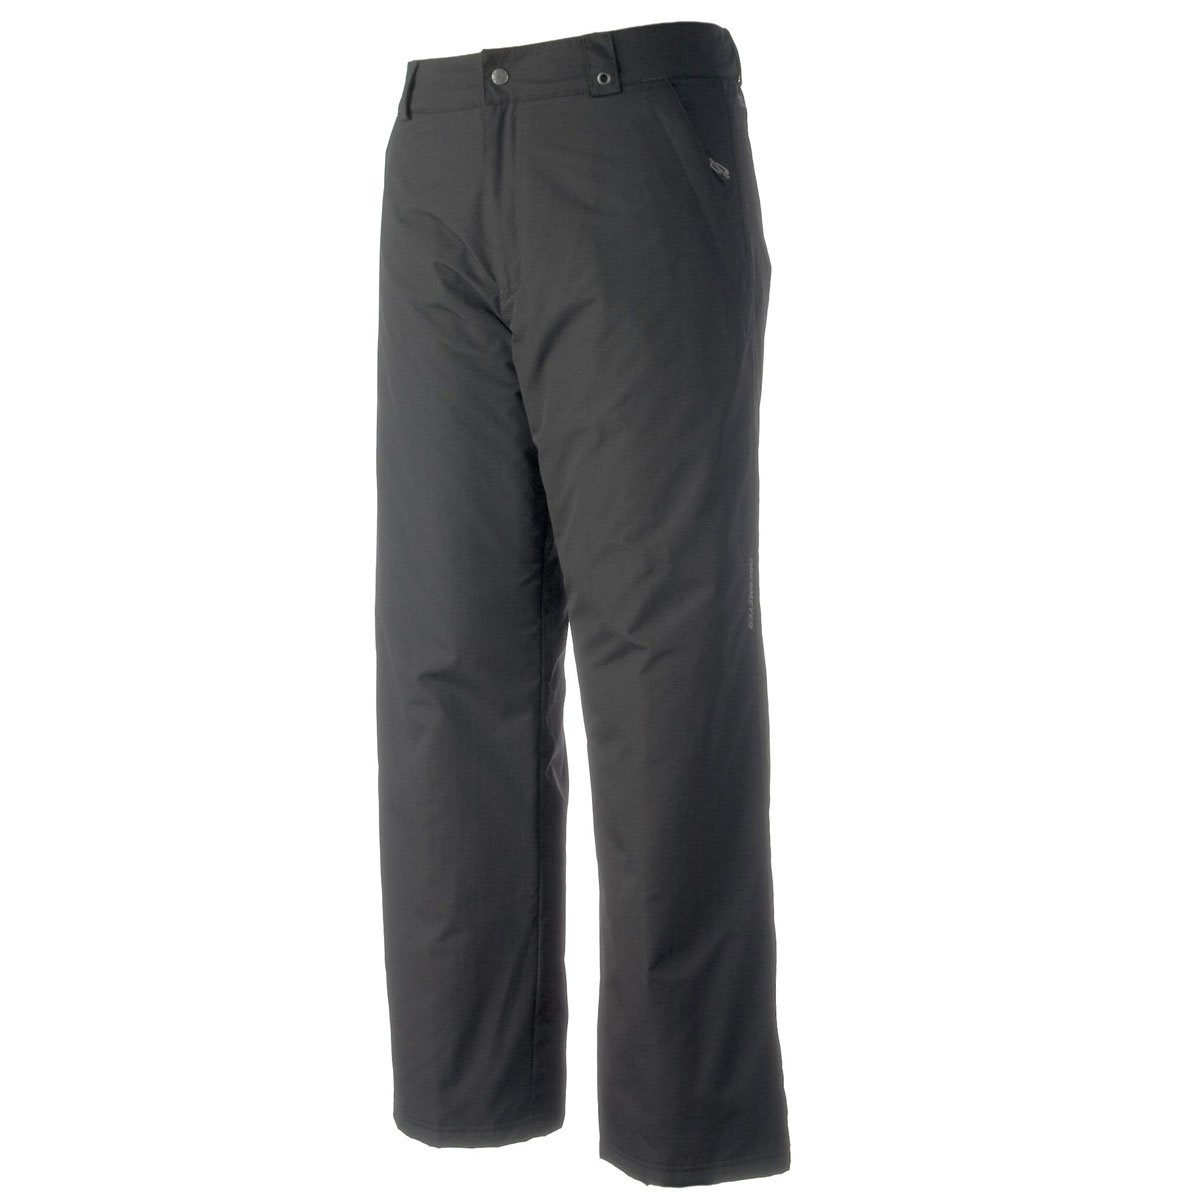 Obermeyer Keystone Insulated Mens Ski Pants 2012